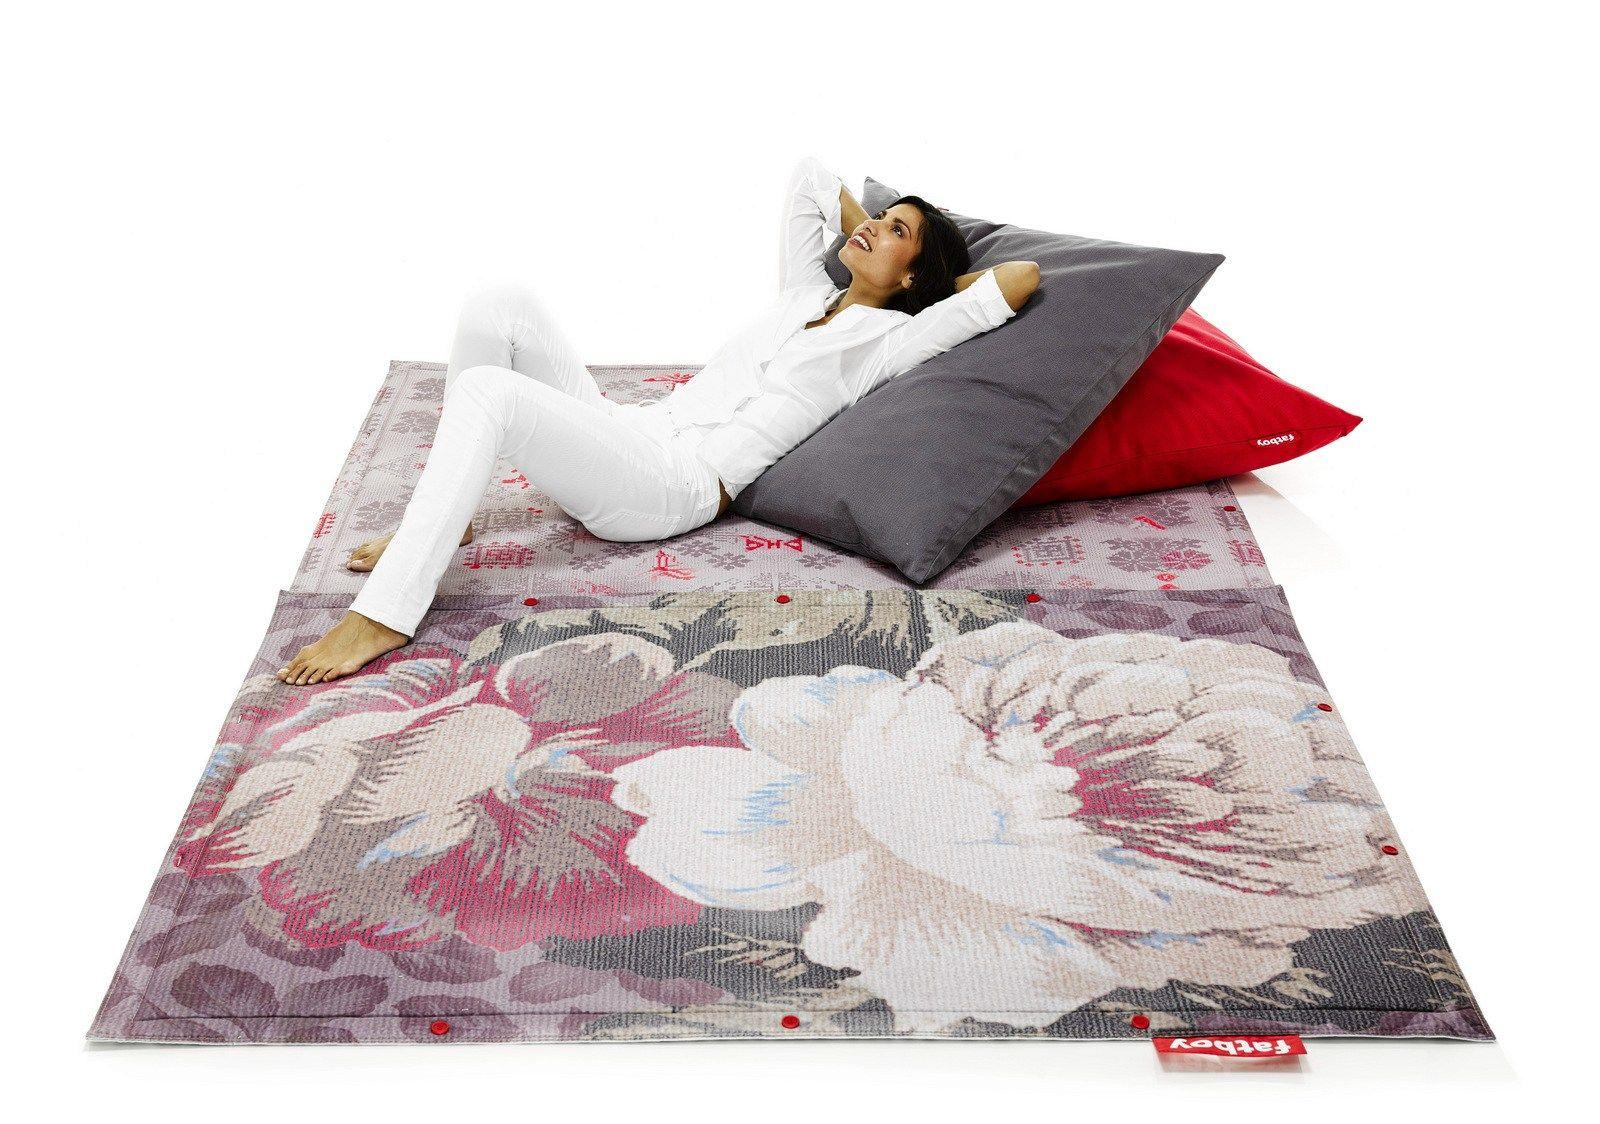 coussin carr e en coton de sol cuscino stonewashed by fatboy italia design studio kluif. Black Bedroom Furniture Sets. Home Design Ideas